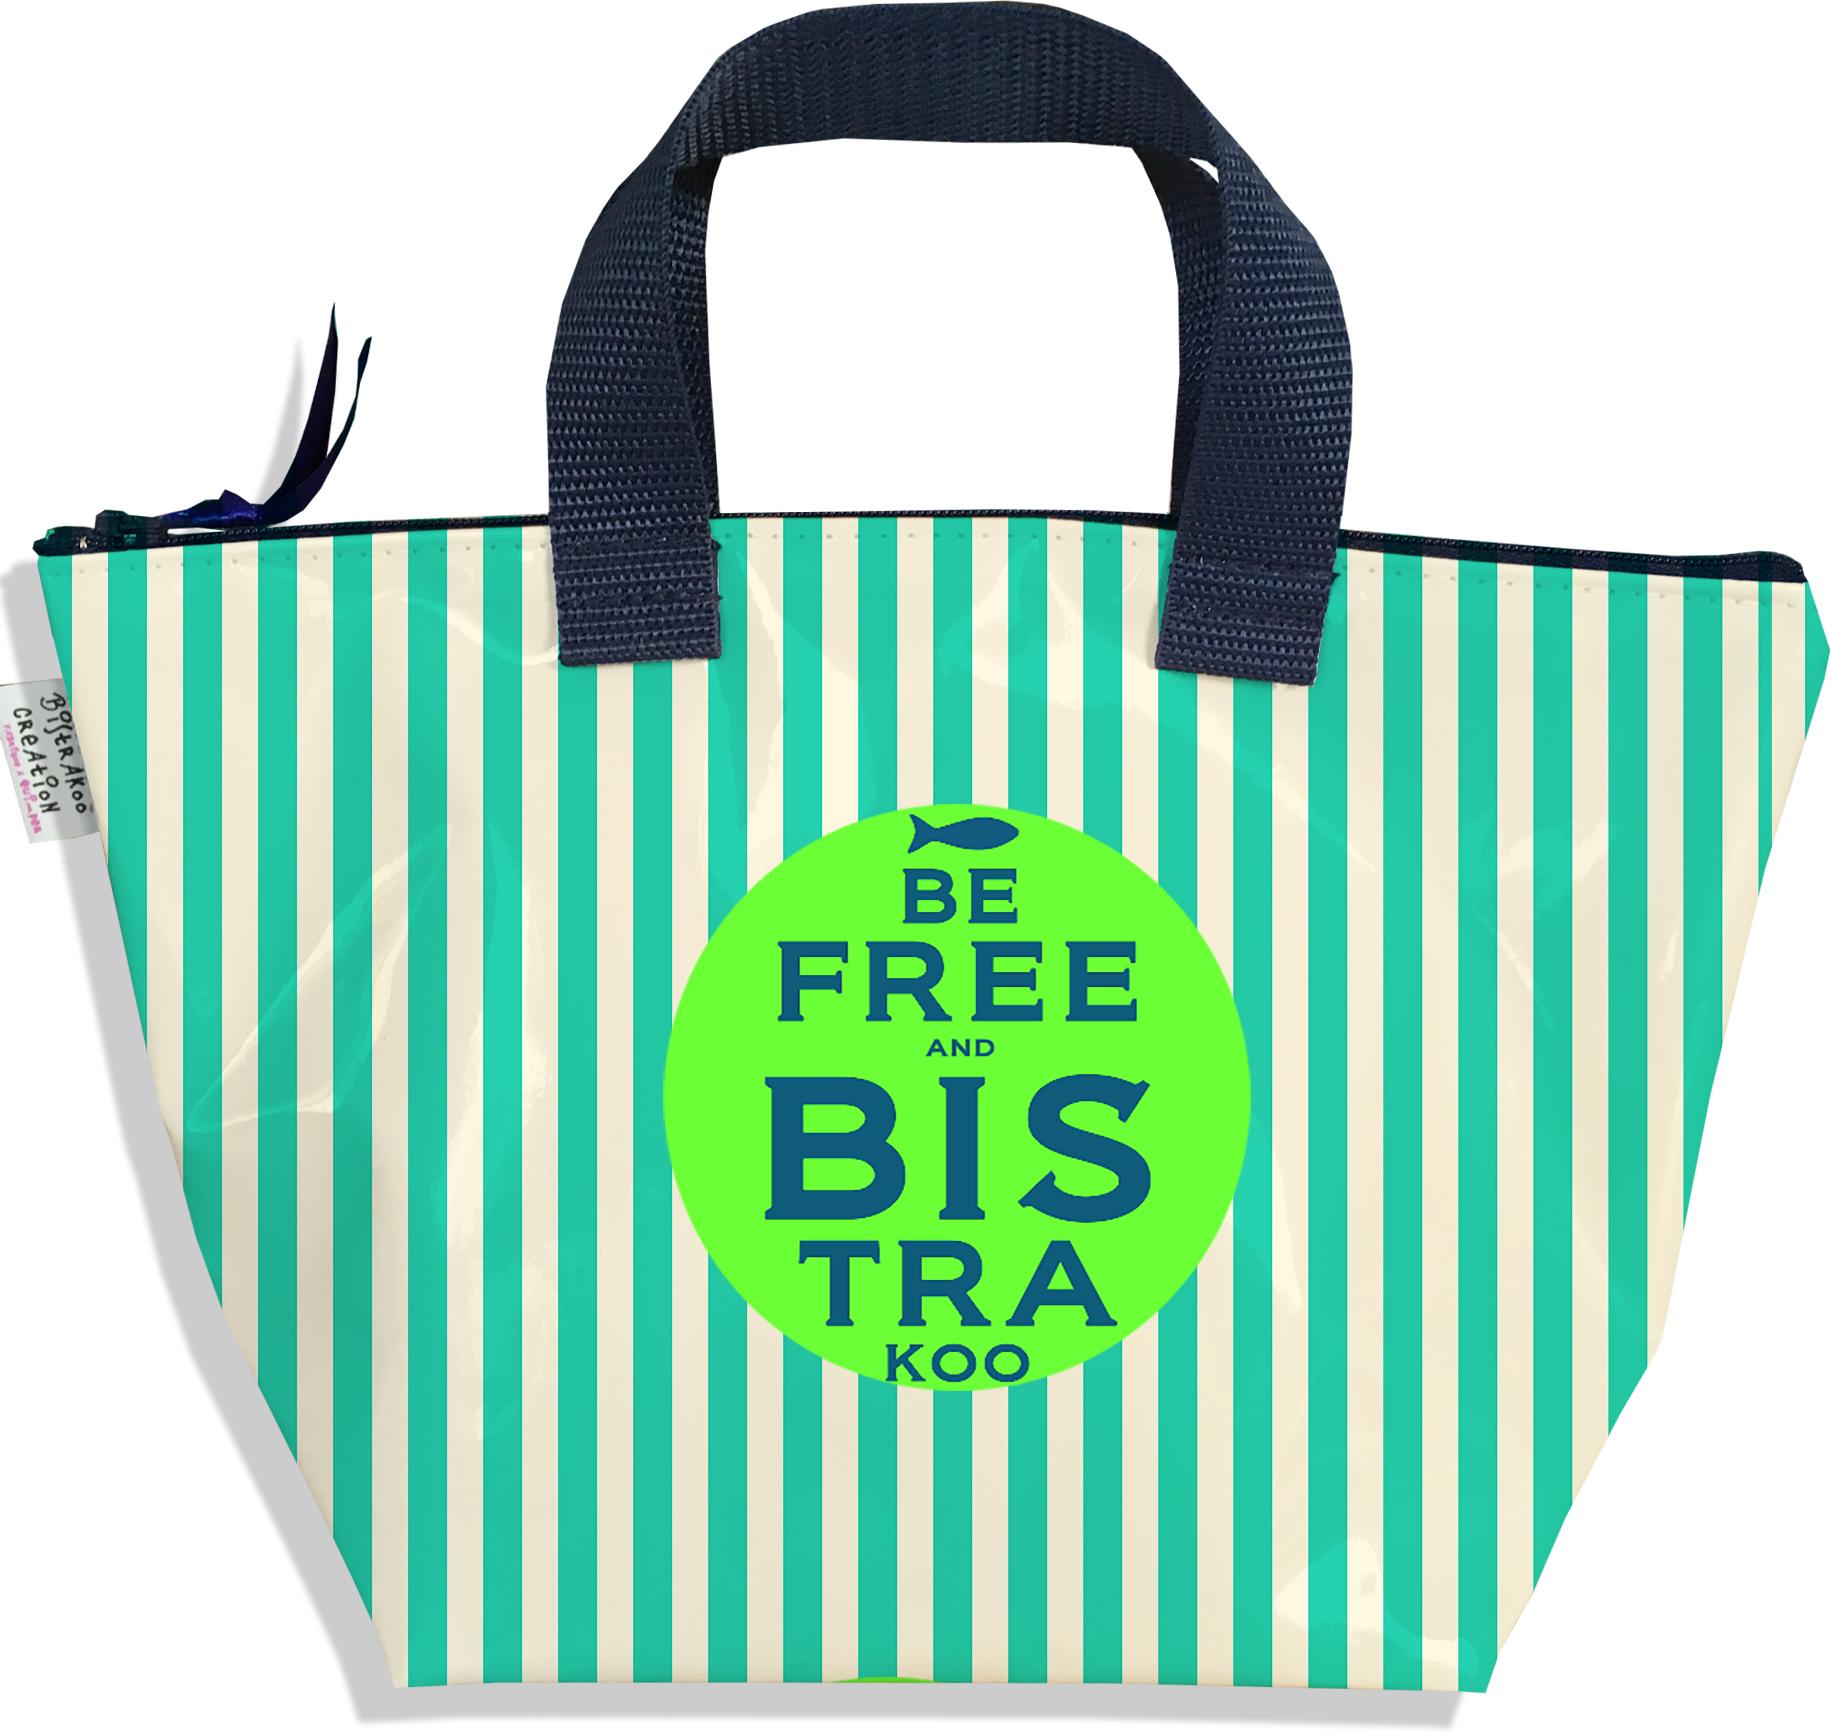 Sac à main zippé pour fille motif Be Free vert 2338-2016